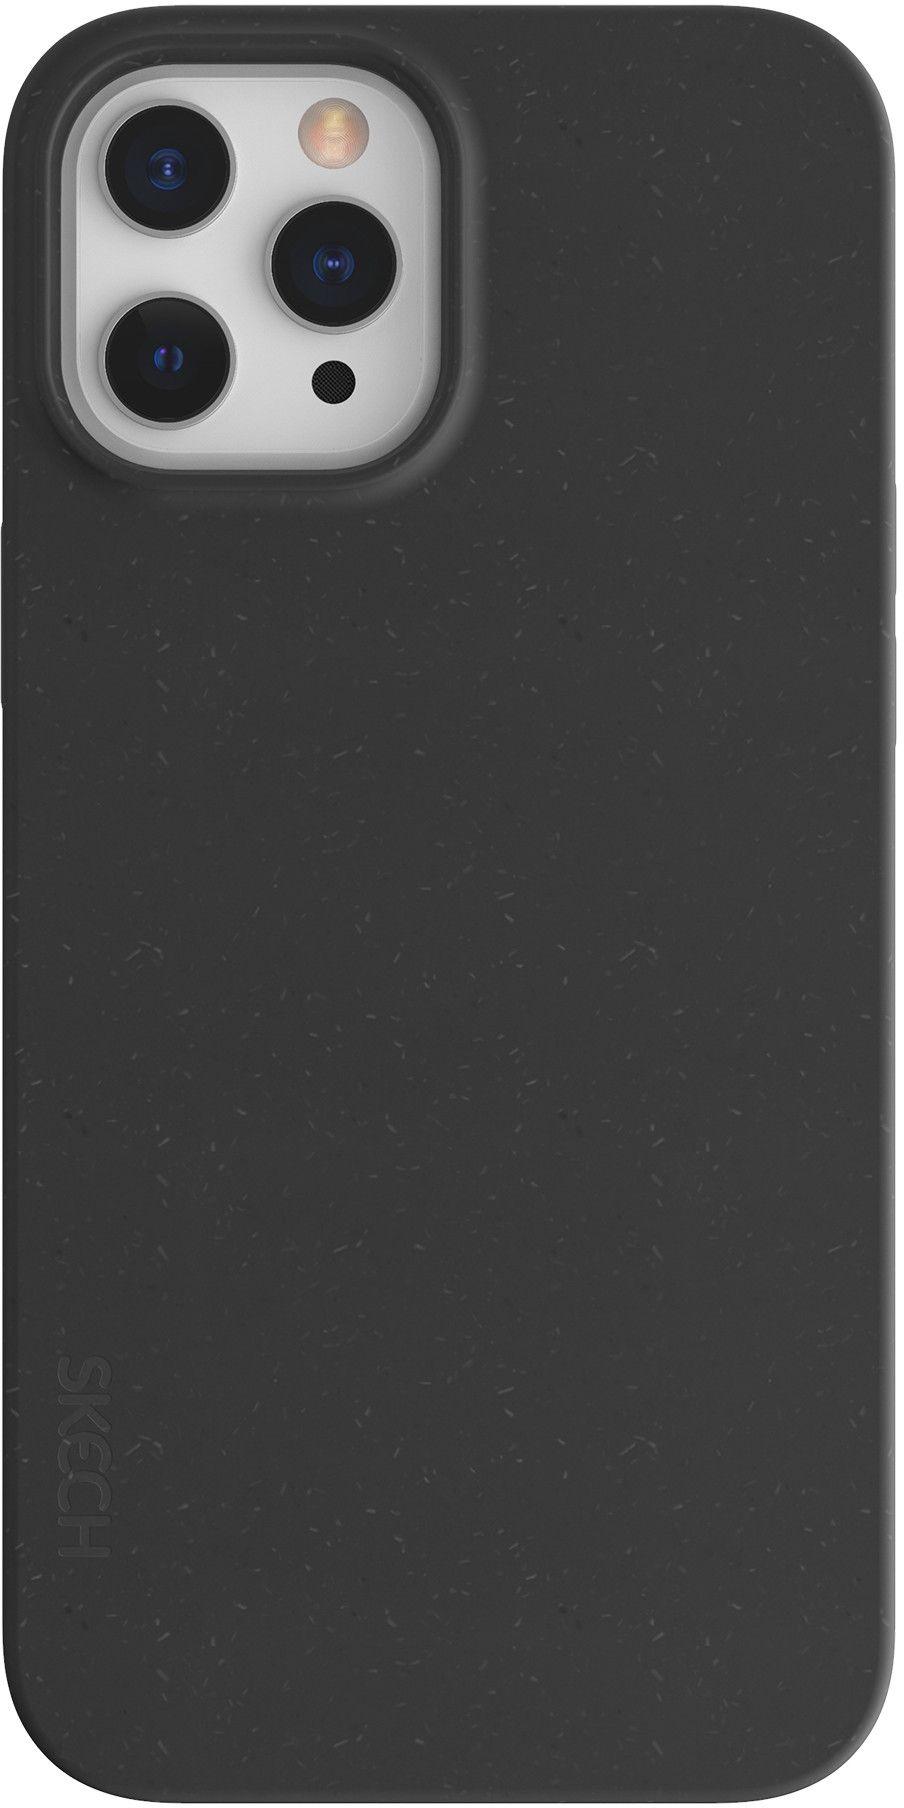 Skech BioCase (iPhone 12 Pro Max) - Grön